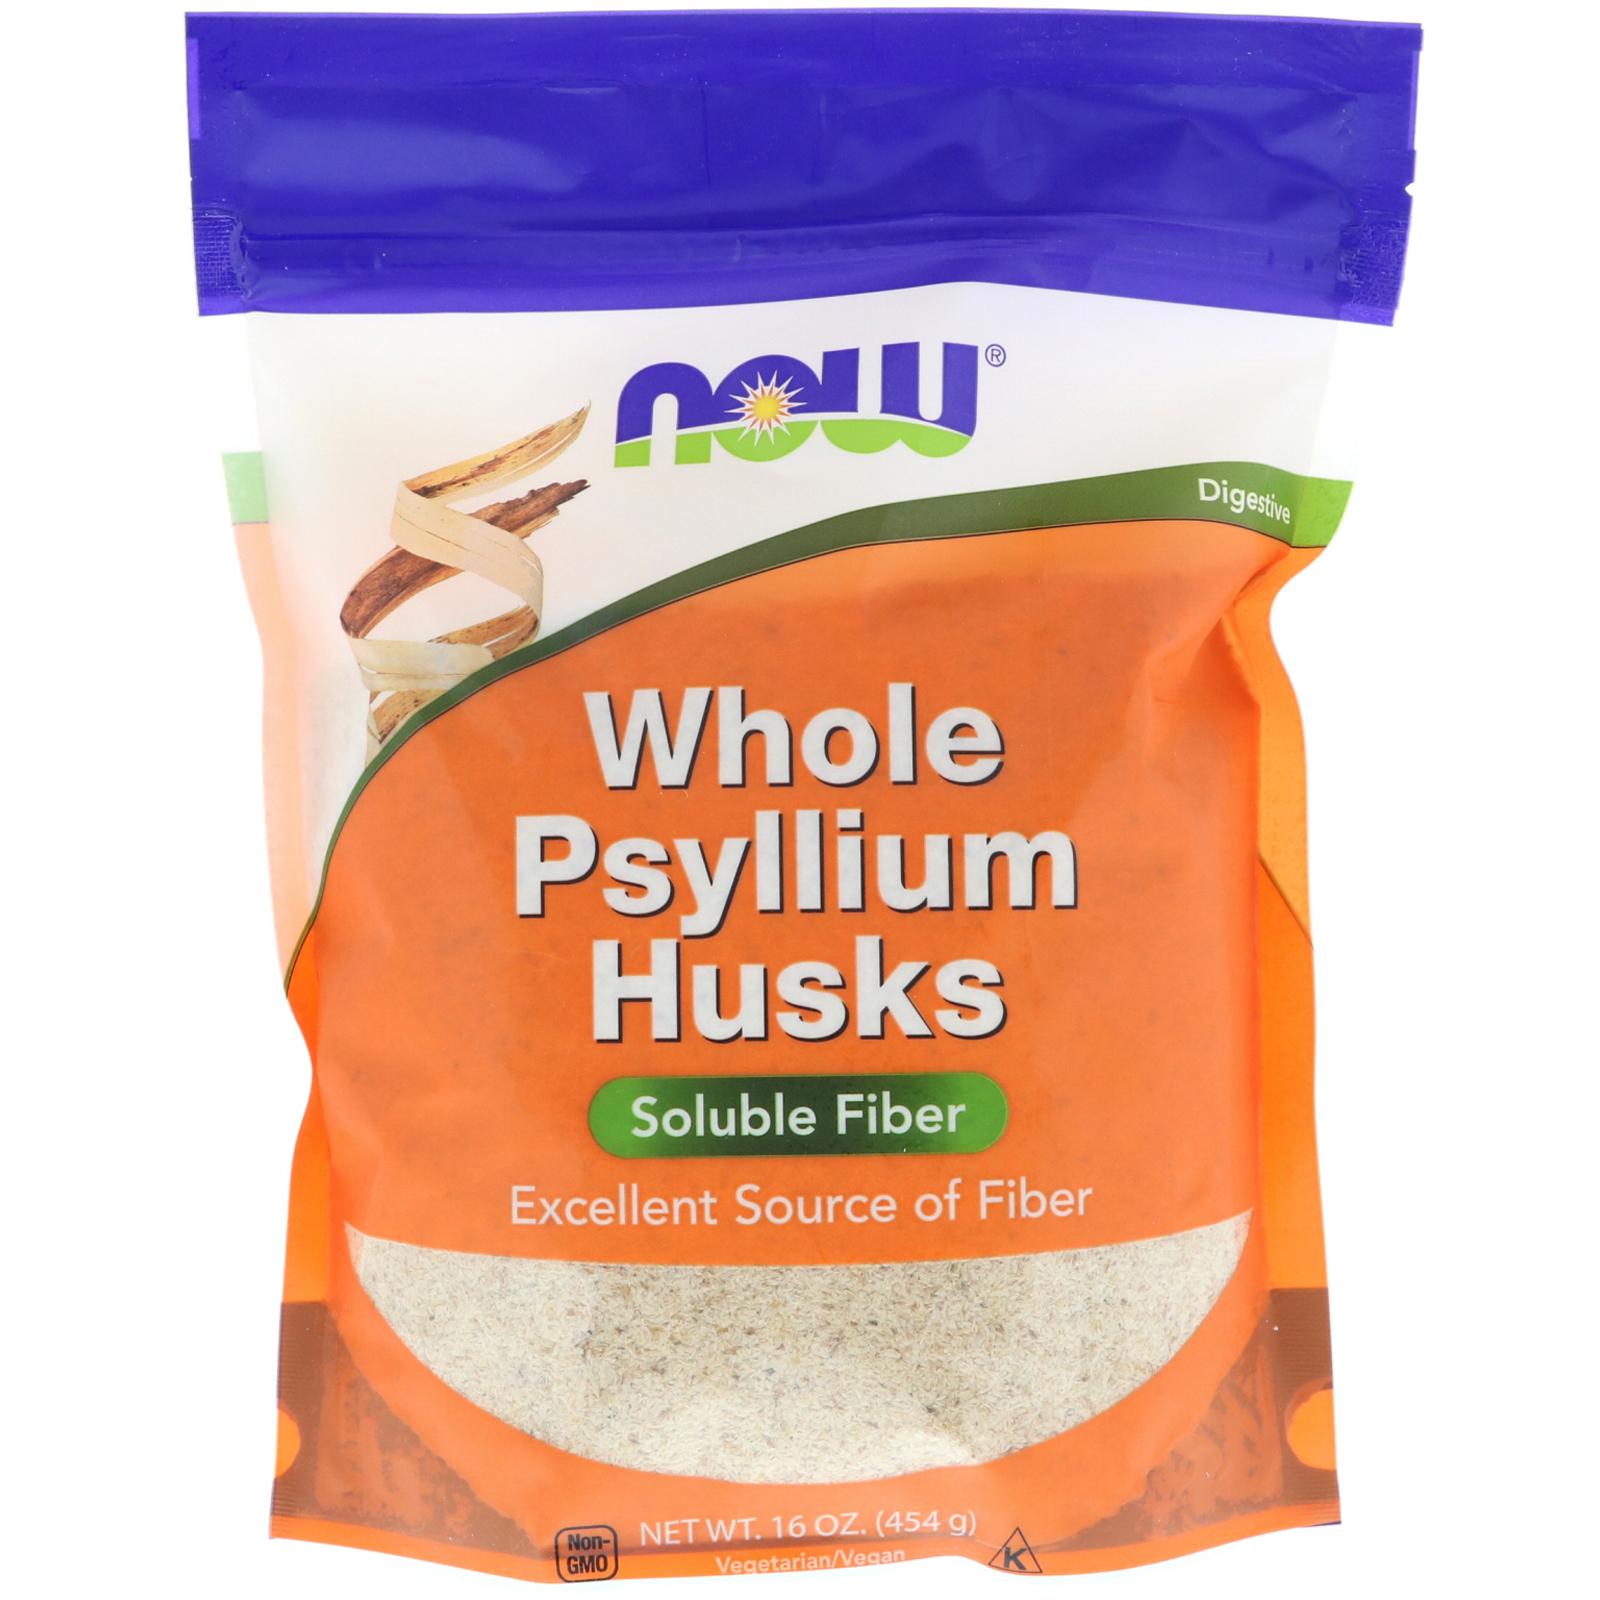 Phenomenal Now Foods Whole Psyllium Husks 16 Oz 454 G Iherb Spiritservingveterans Wood Chair Design Ideas Spiritservingveteransorg